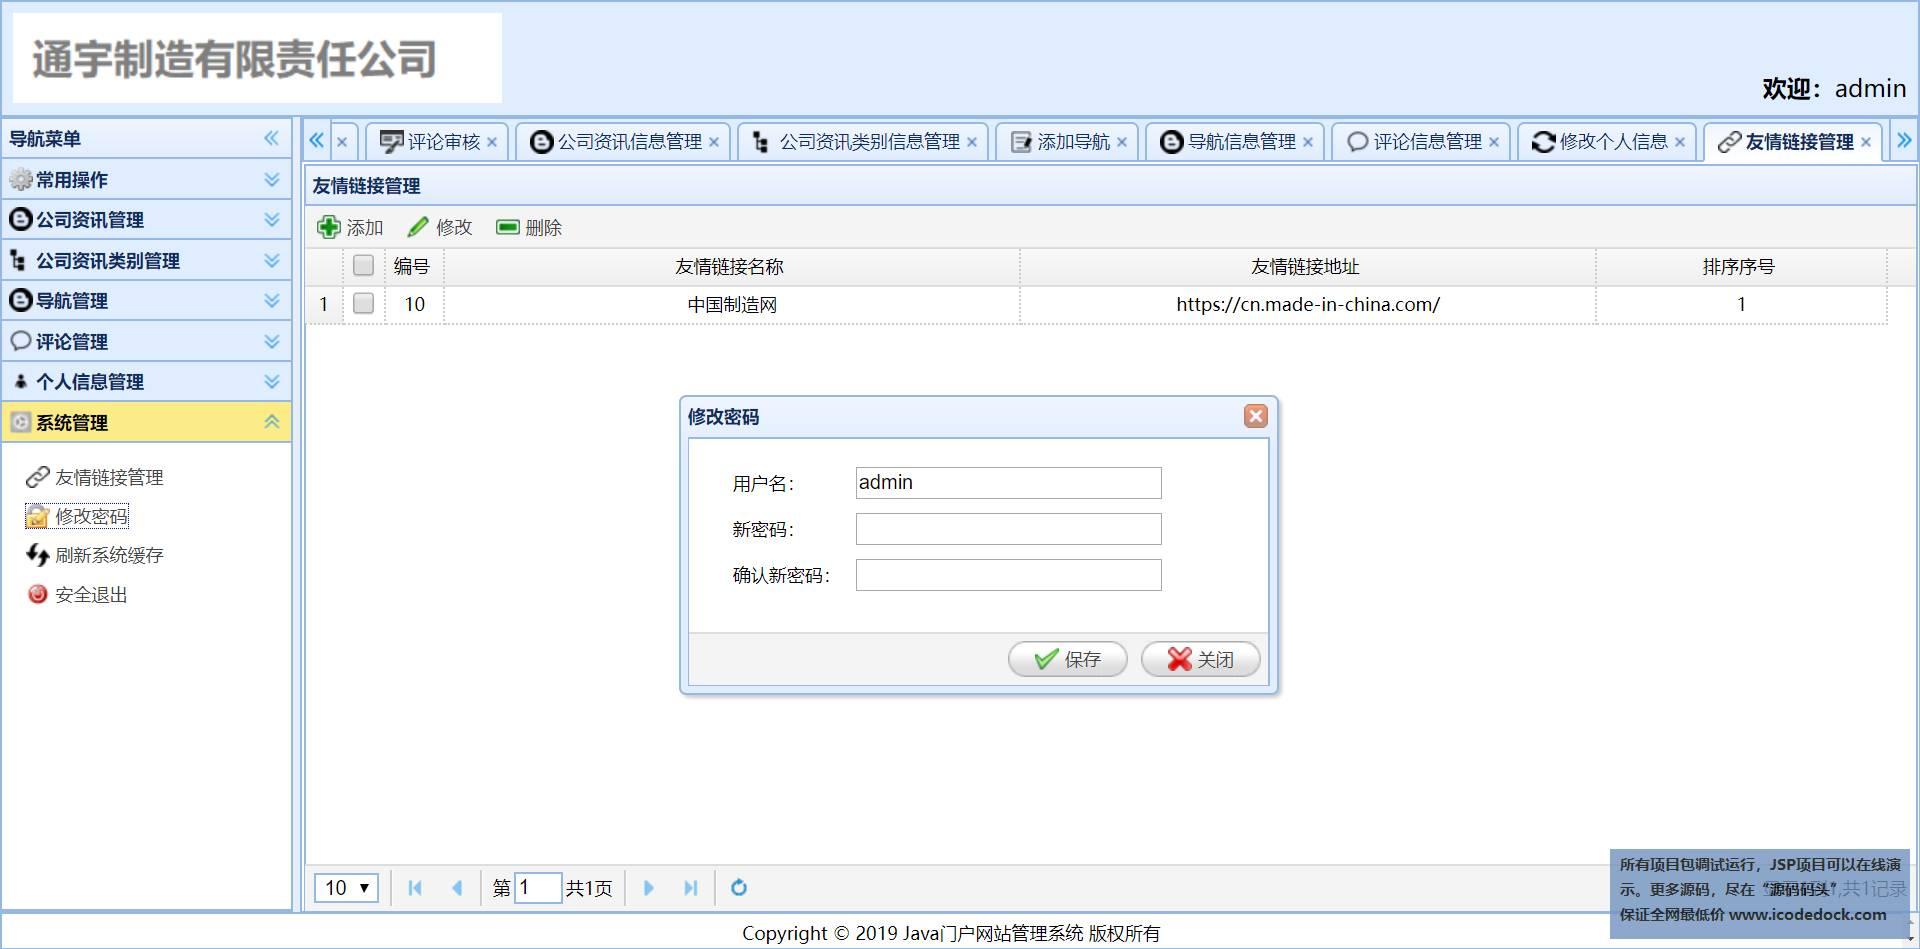 ssm企业网站源码下载(php网站源码 下载) (https://www.oilcn.net.cn/) 网站运营 第16张